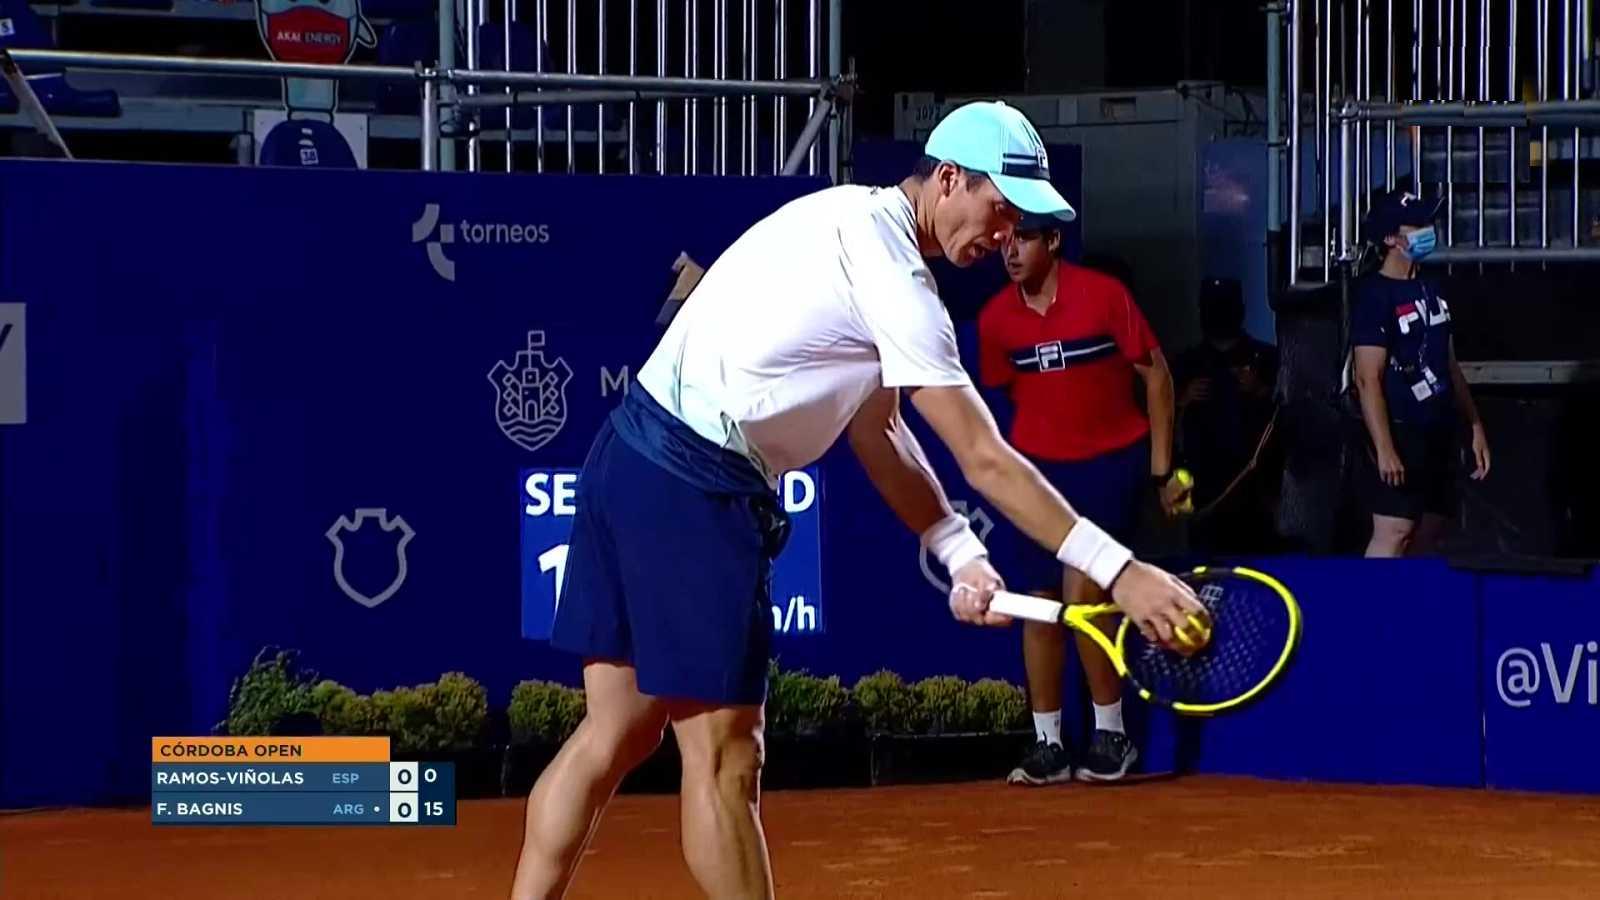 Tenis - ATP 250 Torneo Córdoba. 2ª Semifinal: A. Ramos - F. Bagnis - ver ahora